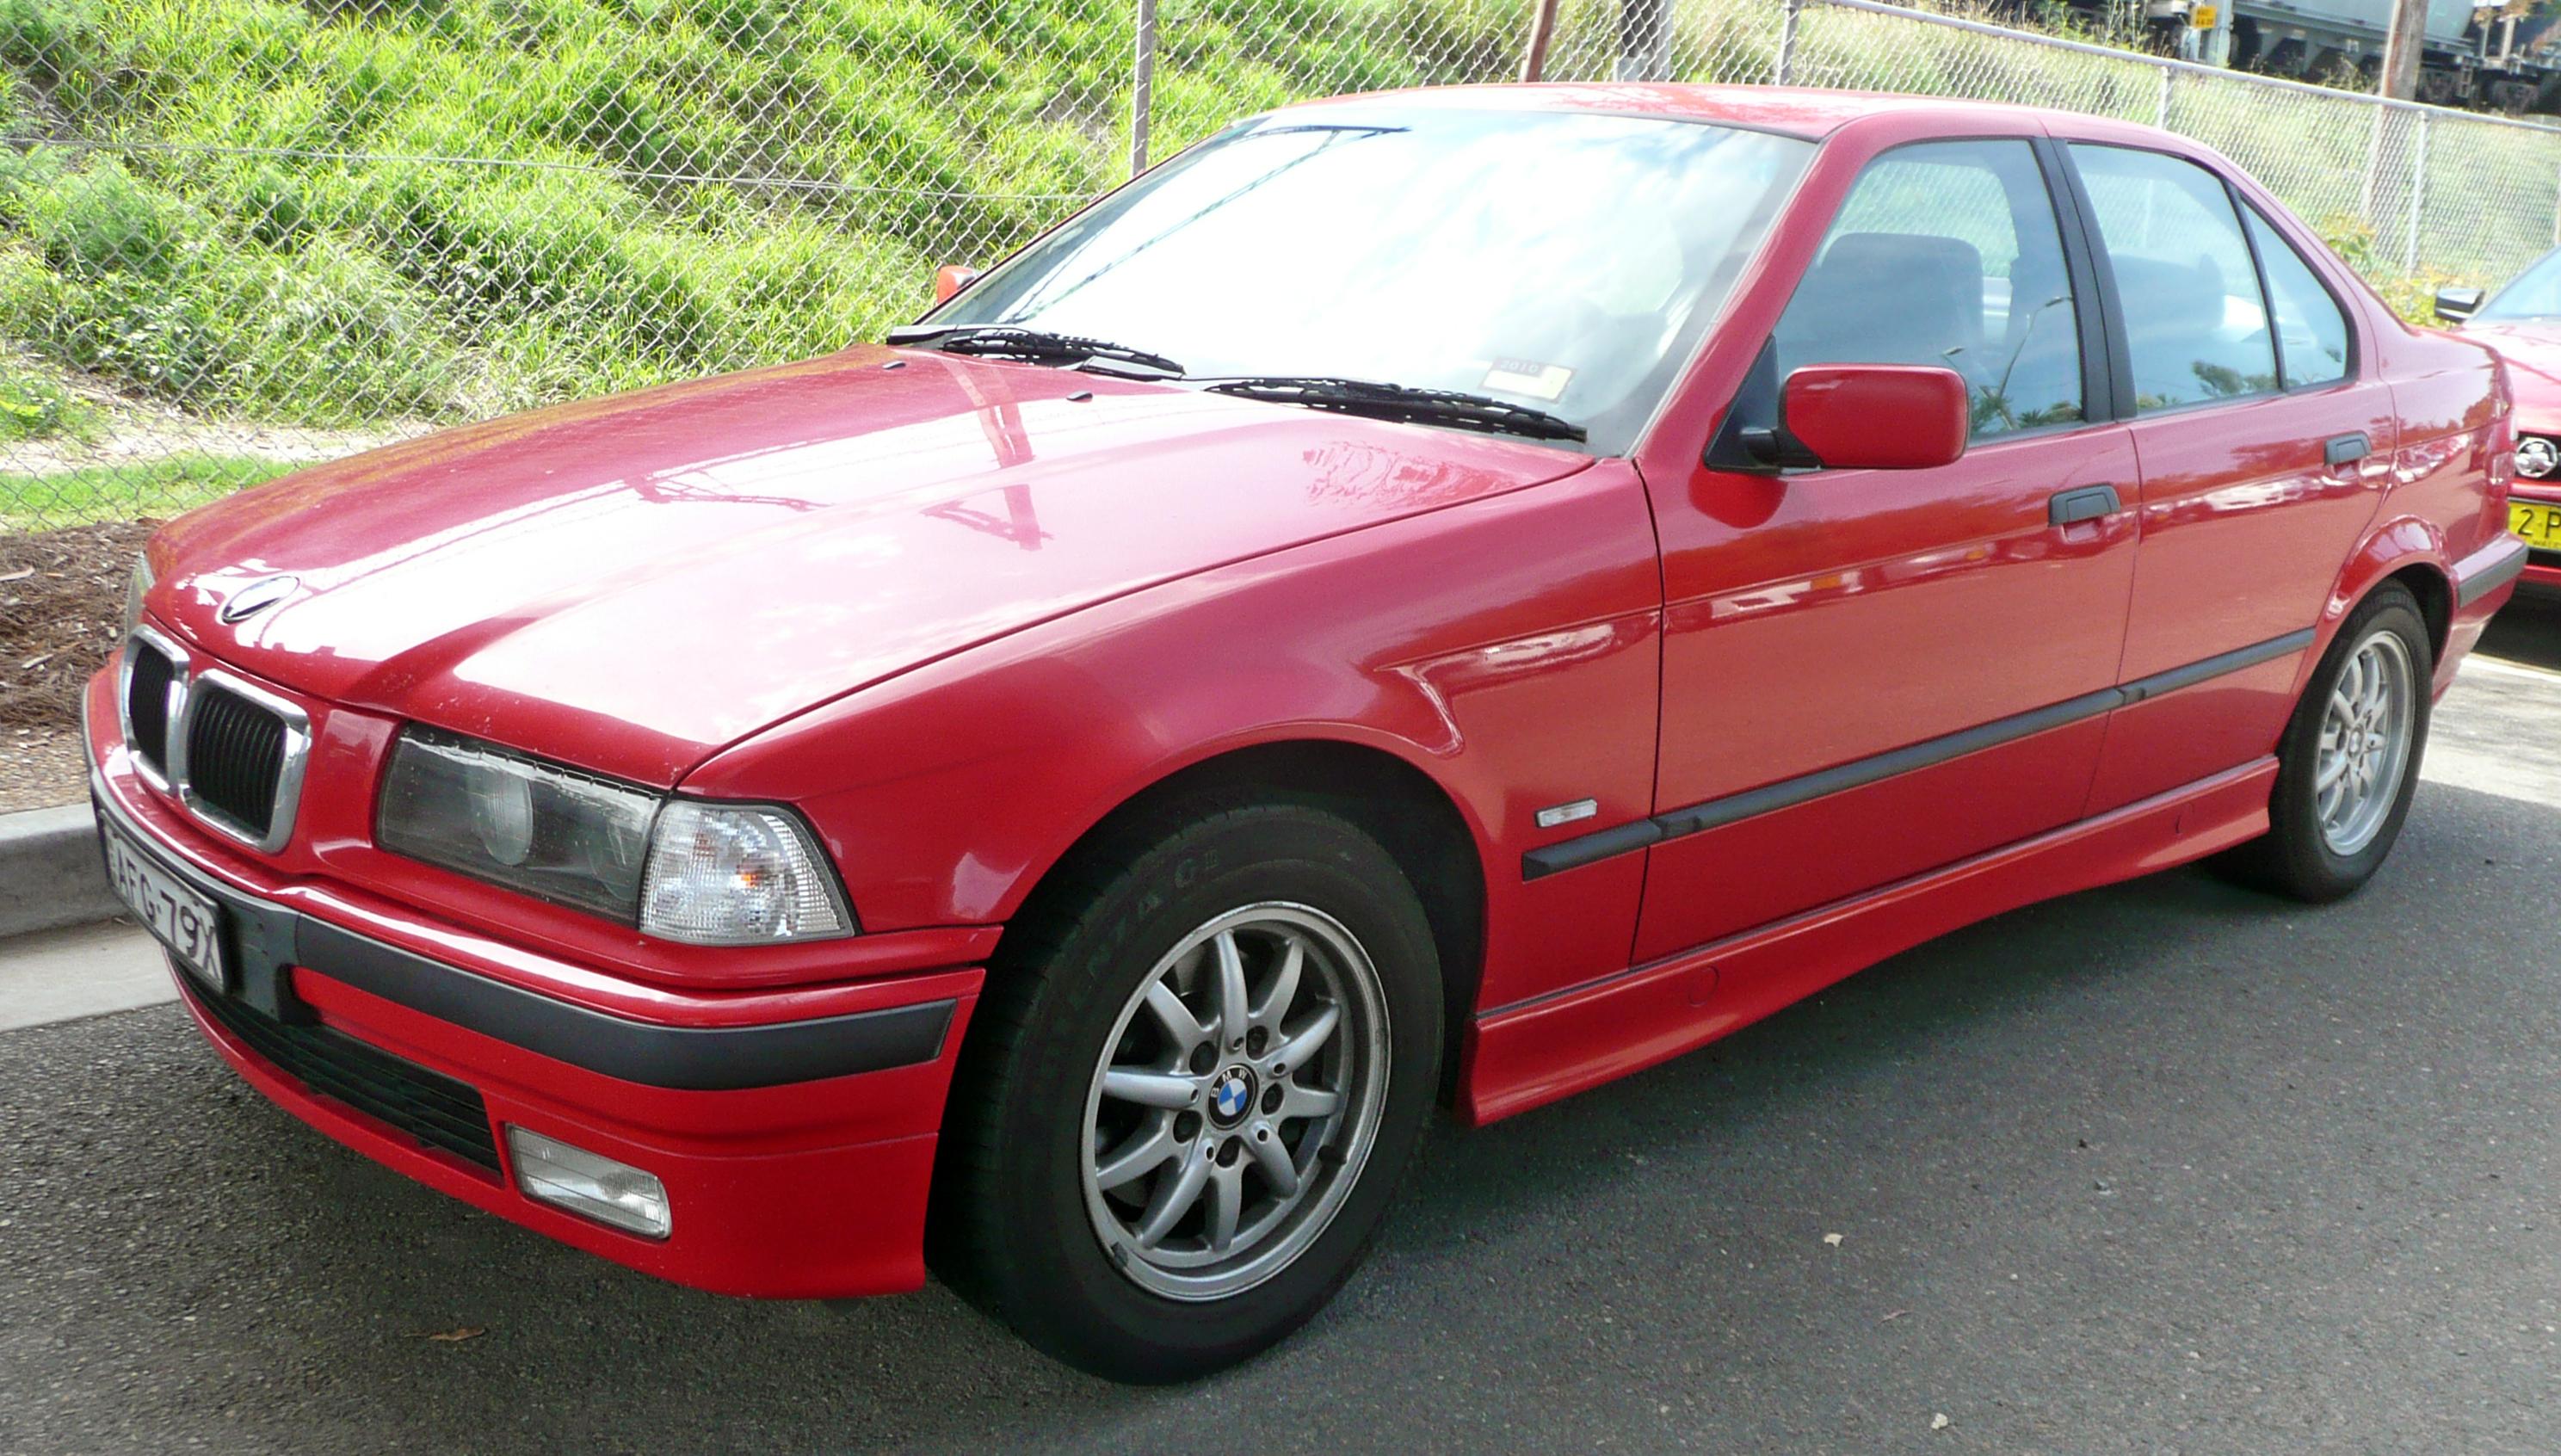 File:1996-1998 BMW 323i (E36) sedan 01.jpg - Wikimedia Commons